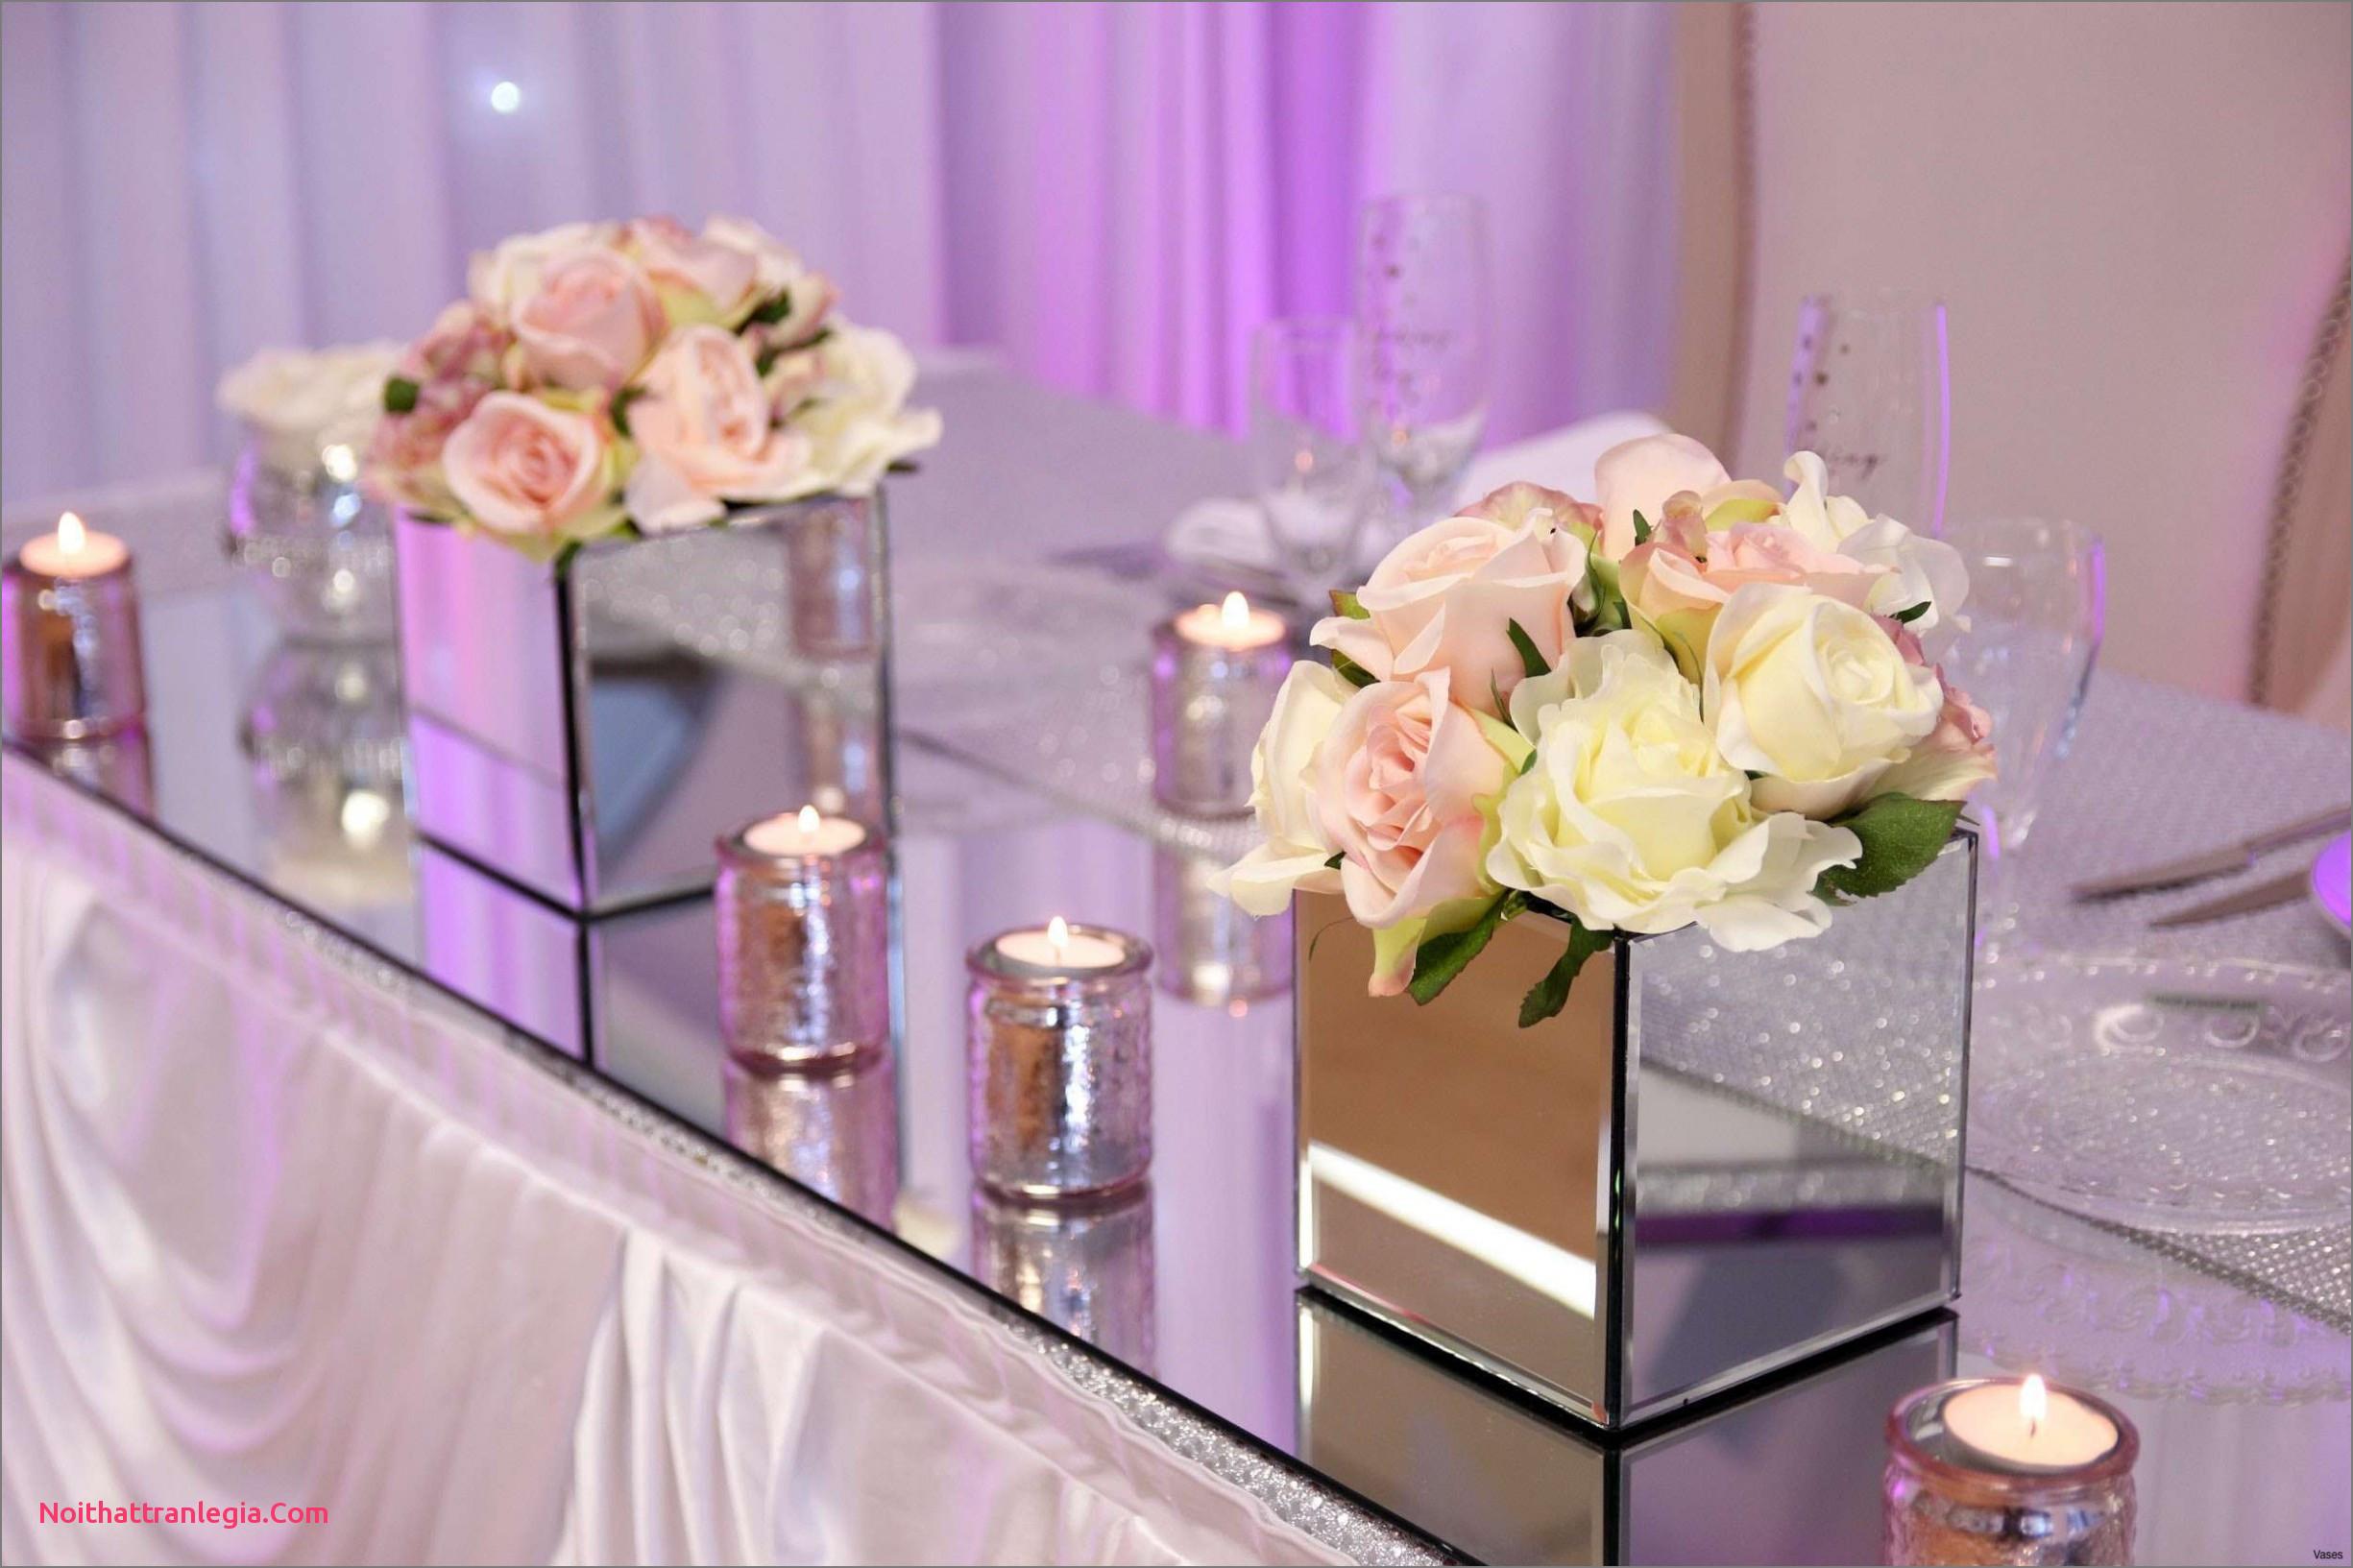 clear acrylic square vases of 20 wedding vases noithattranlegia vases design in mirrored square vase 3h vases mirror table decorationi 0d weddings